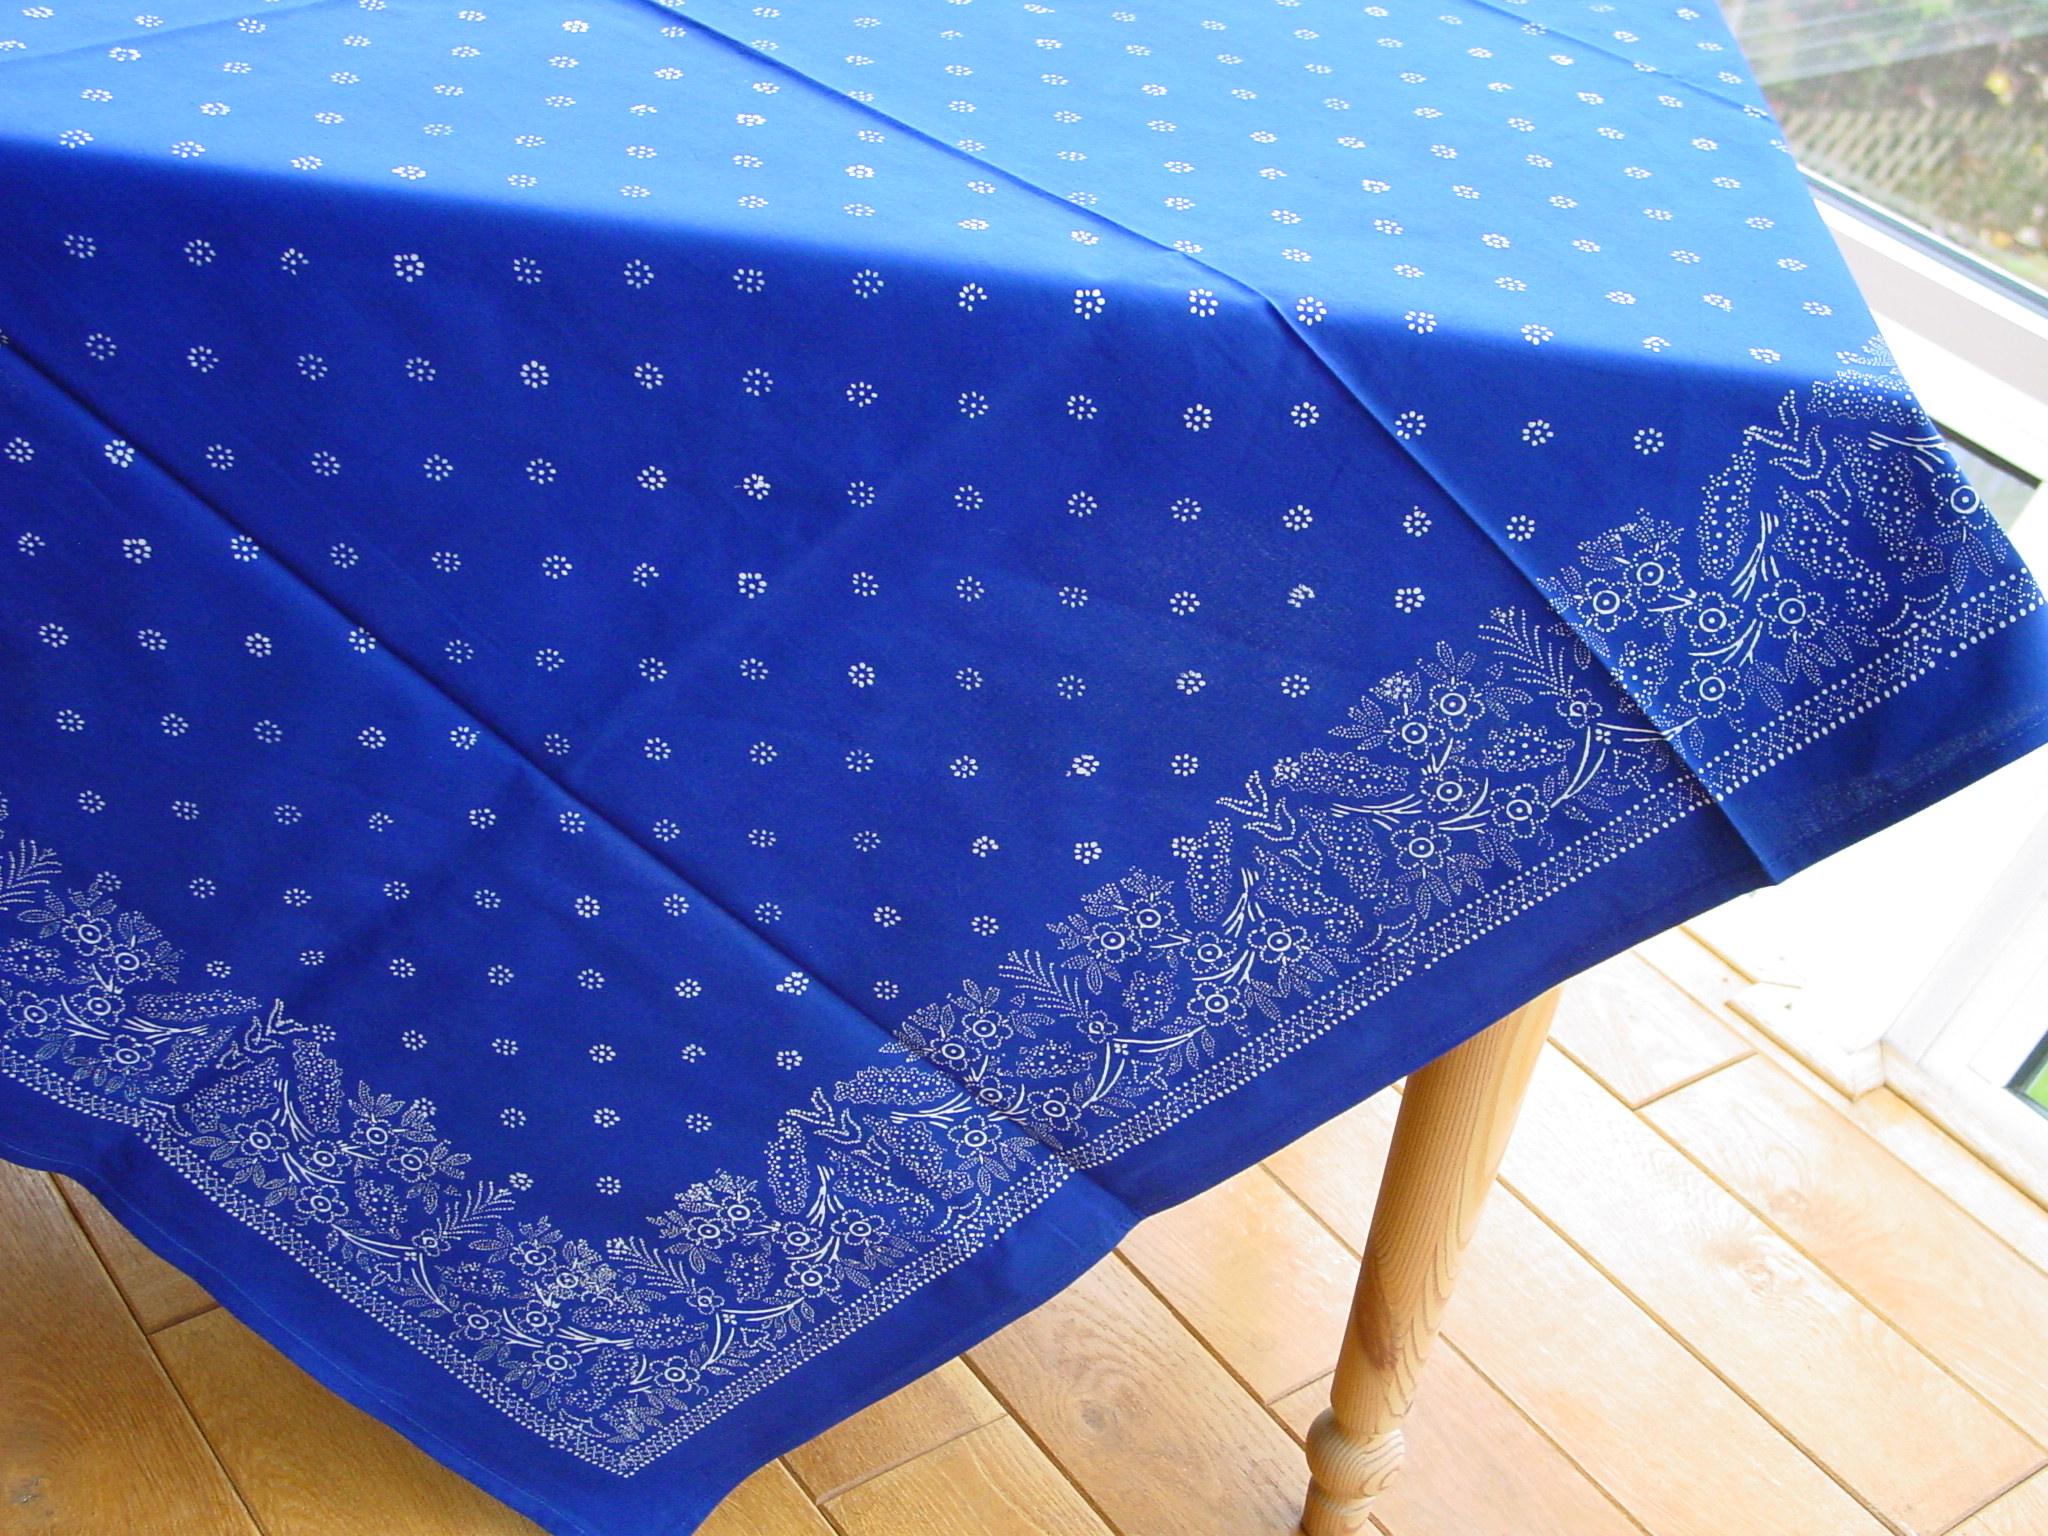 Große Blaudruck-Tischdecke 6483-0